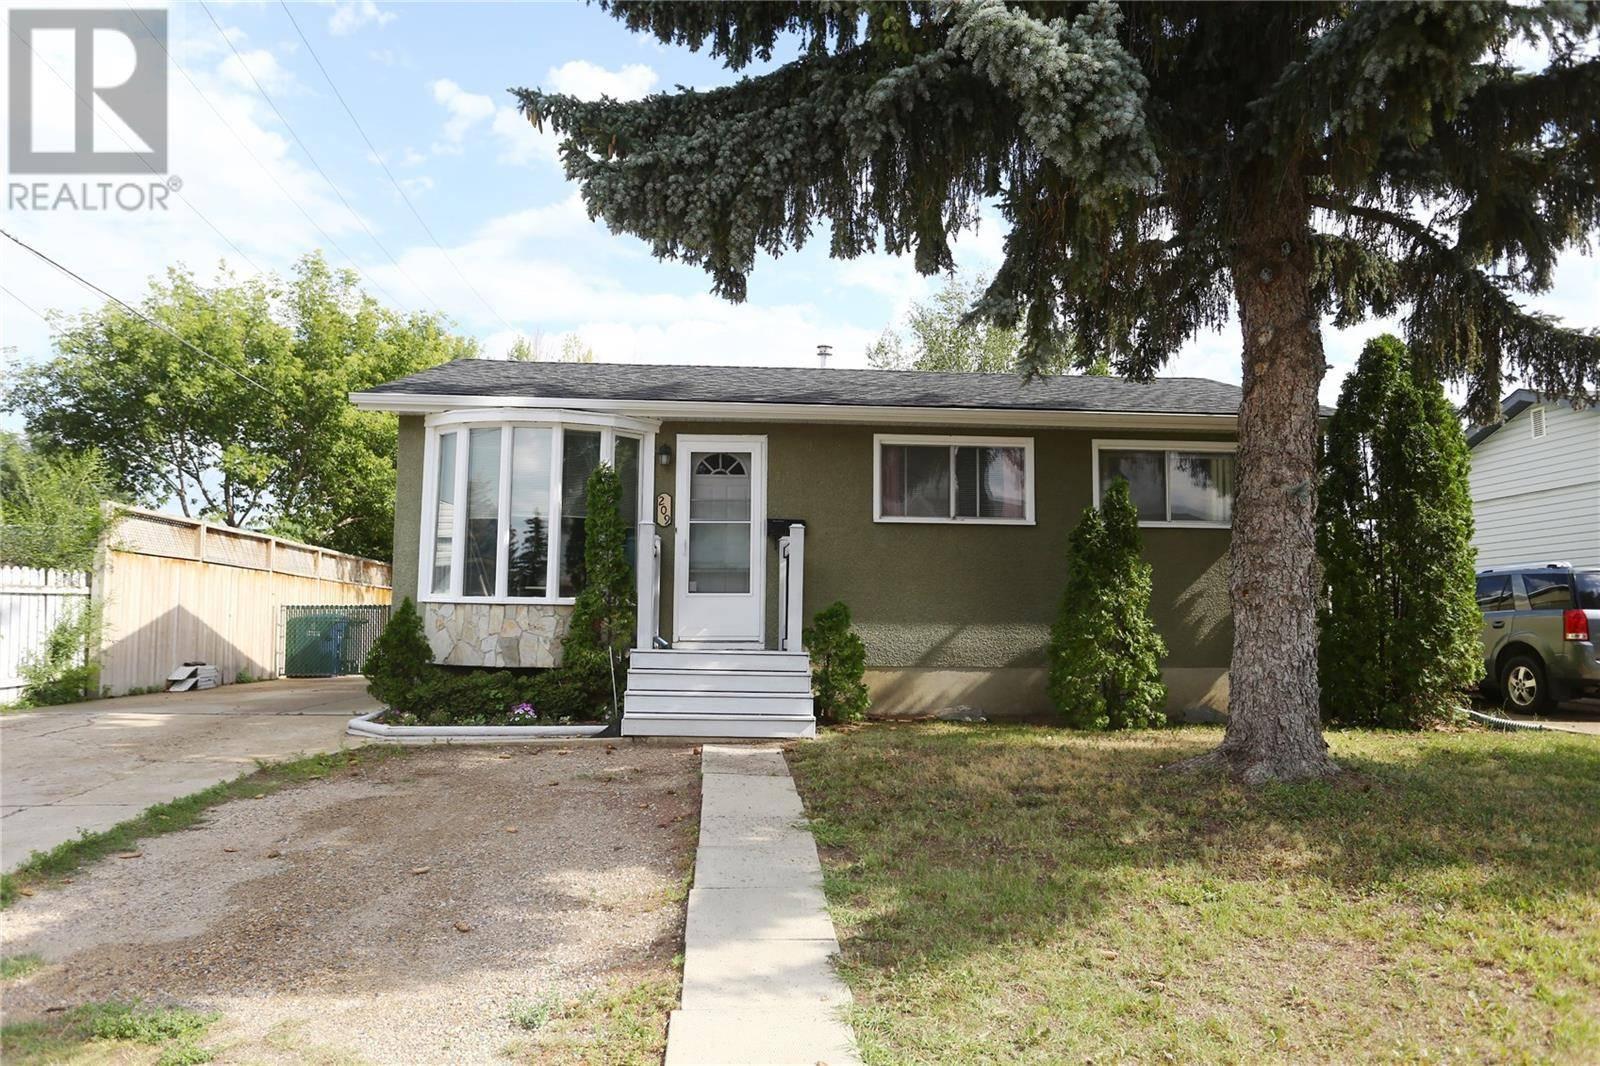 House for sale at 209 Grant St Saskatoon Saskatchewan - MLS: SK783275